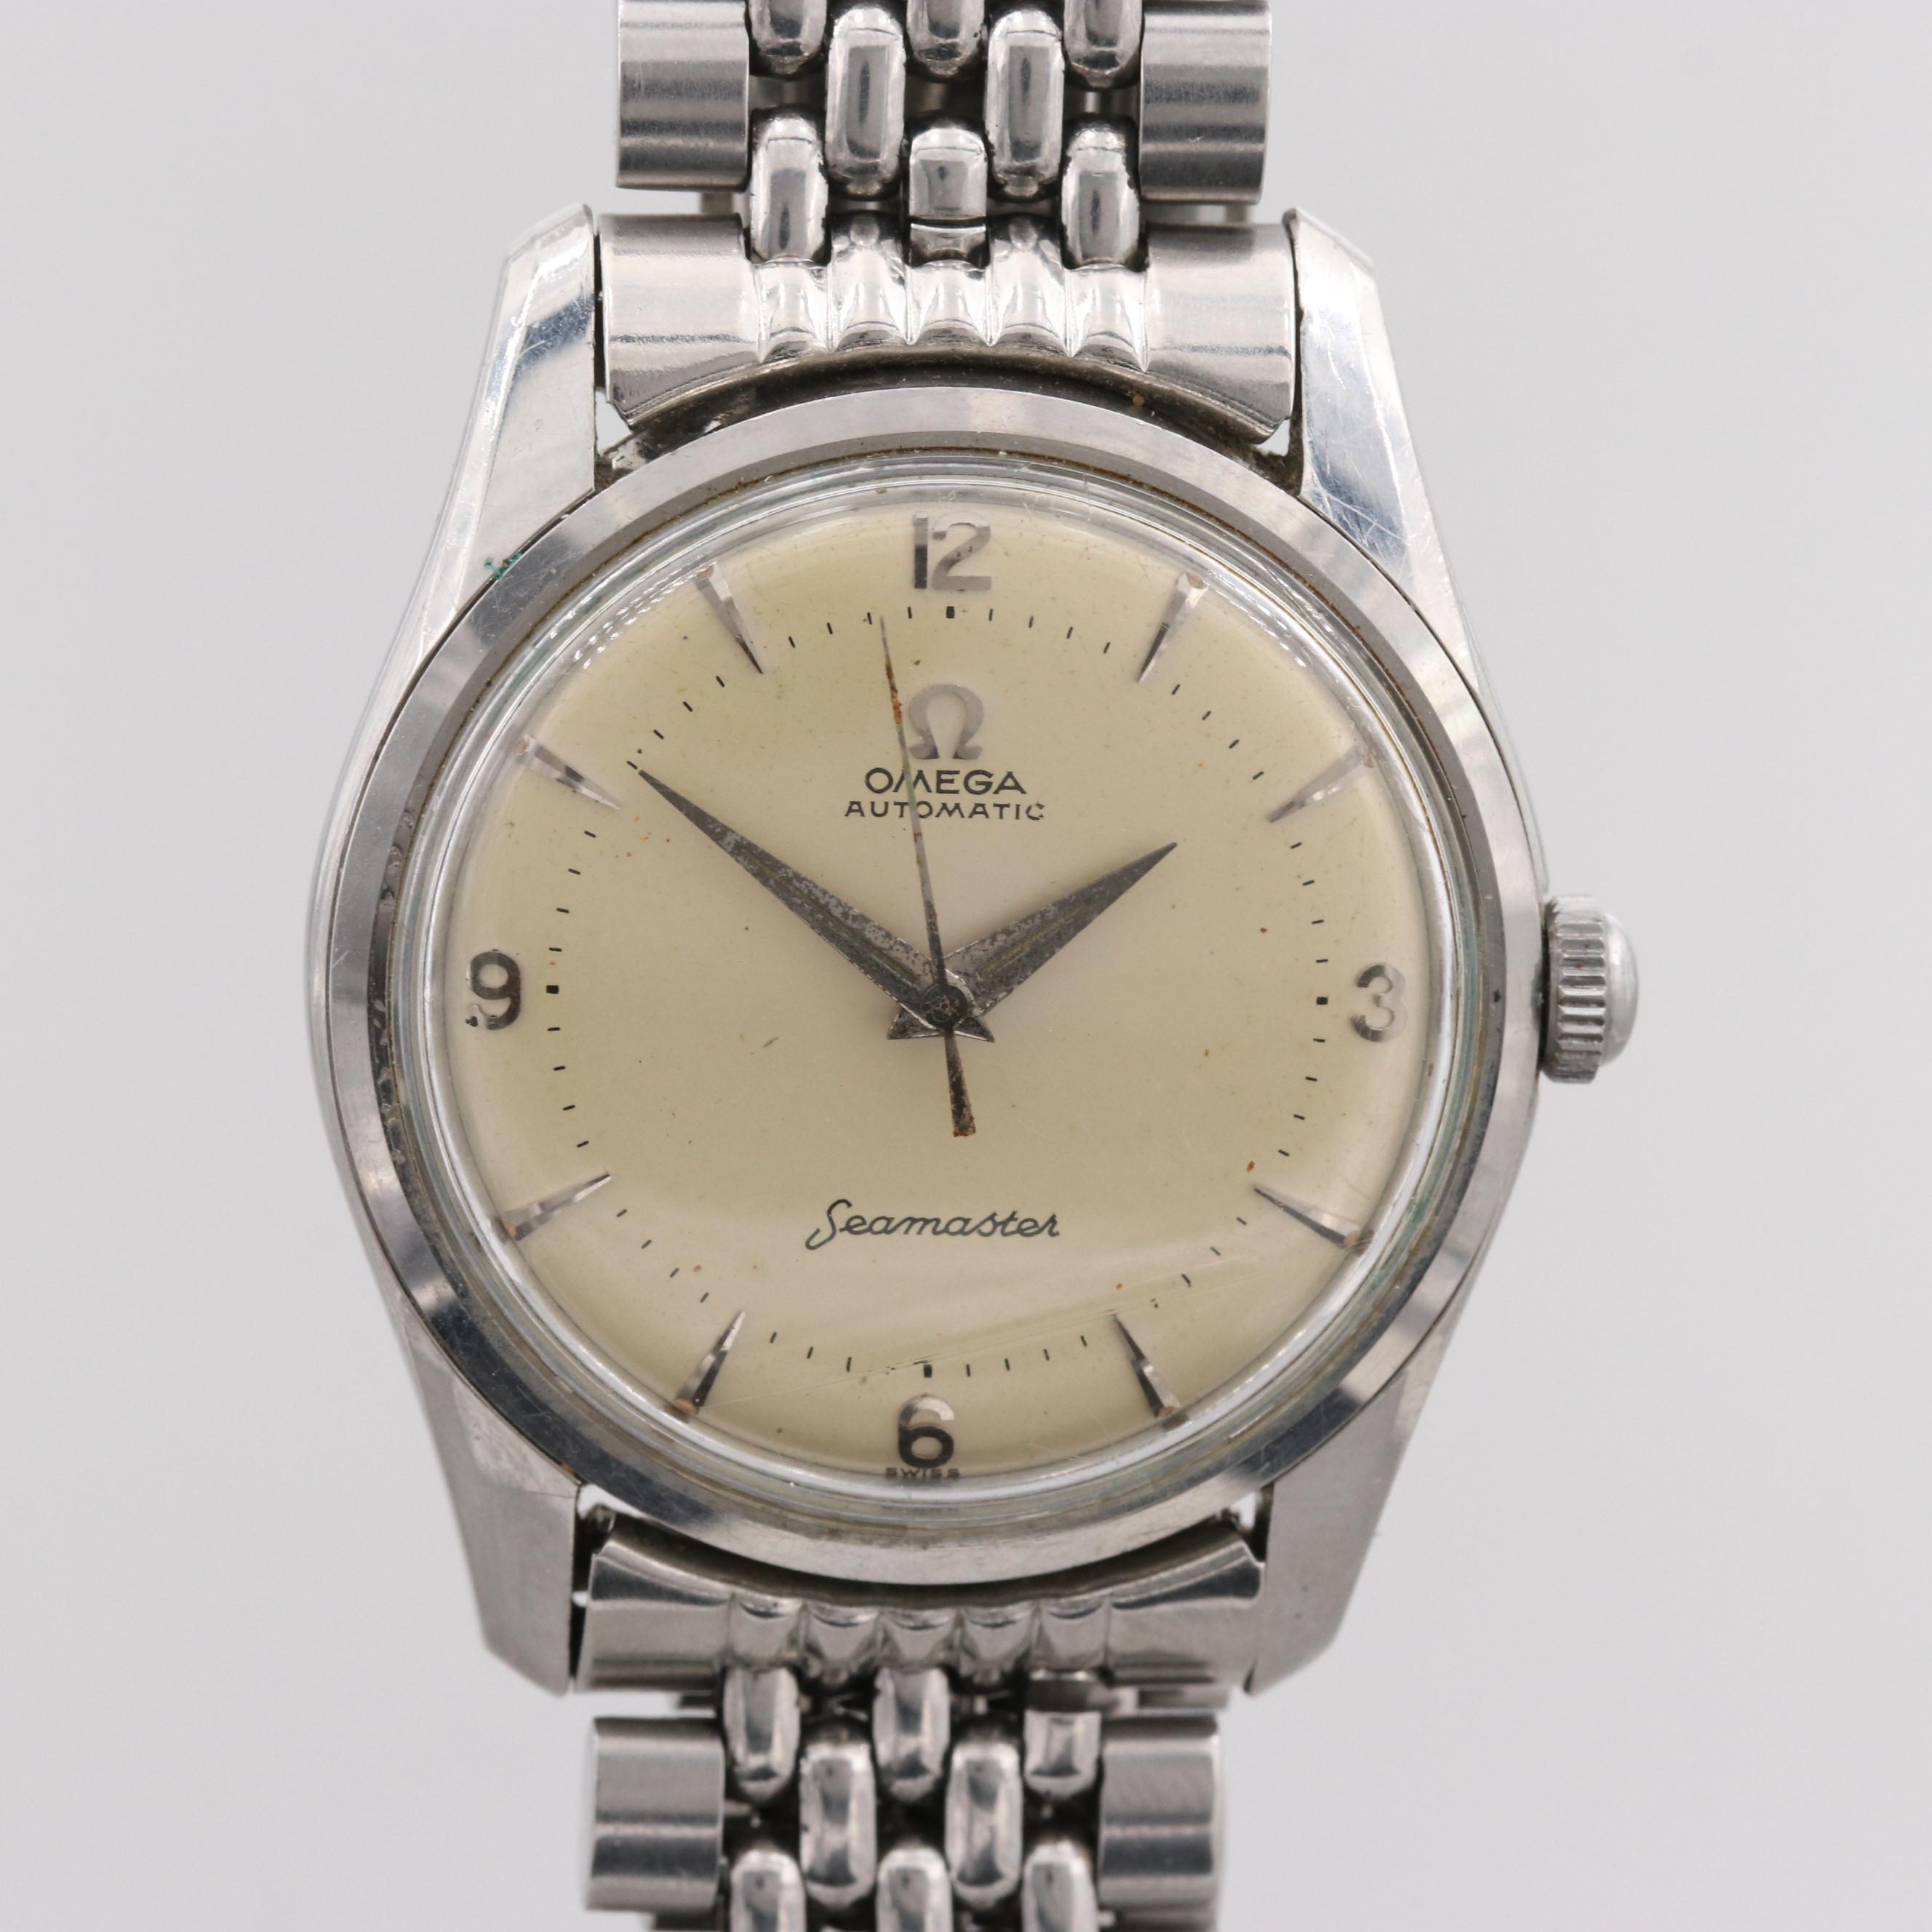 Vintage Omega Seamaster Stainless Steel Wristwatch